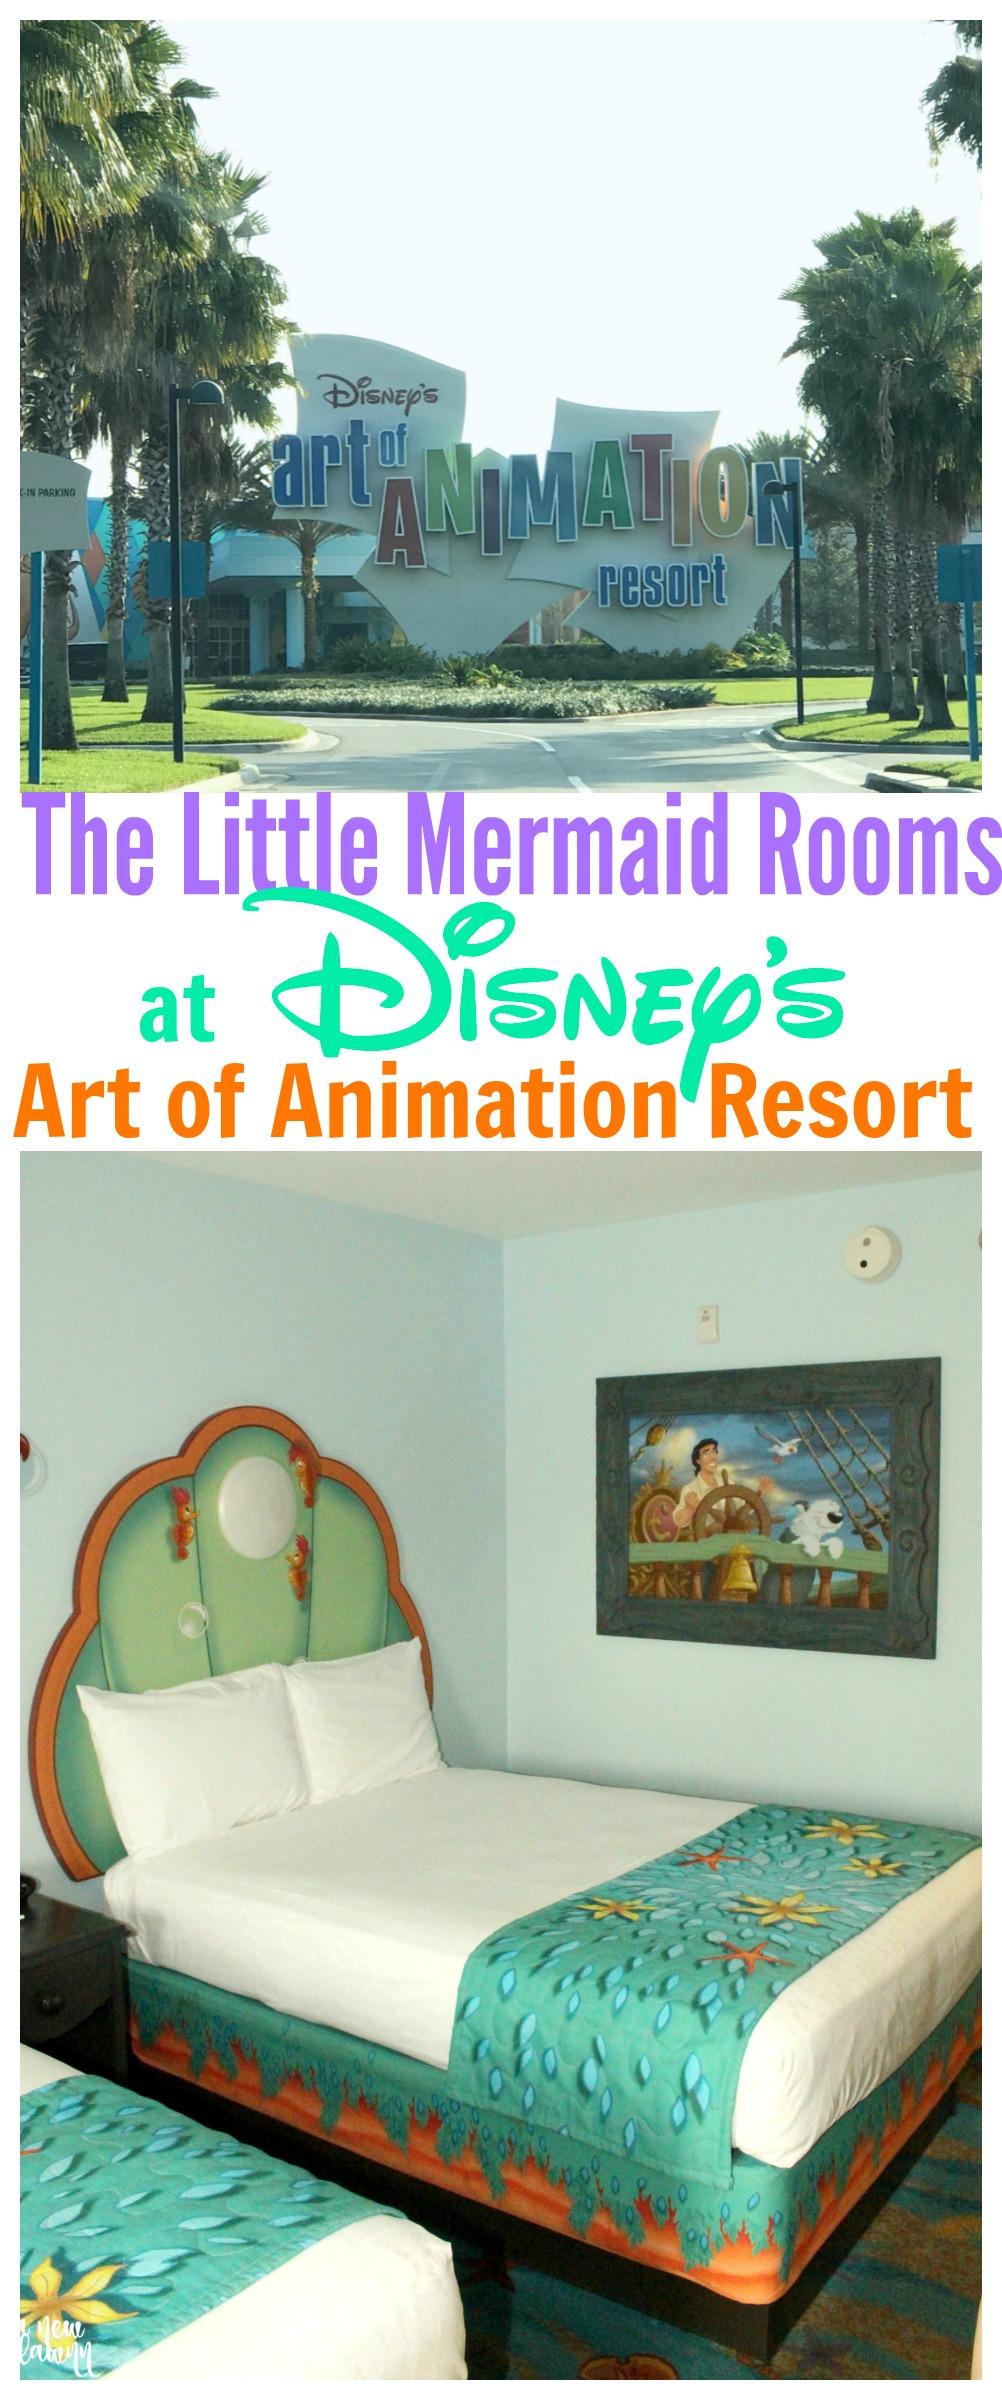 Disney's Art of Animation Resort - The Little Mermaid Rooms